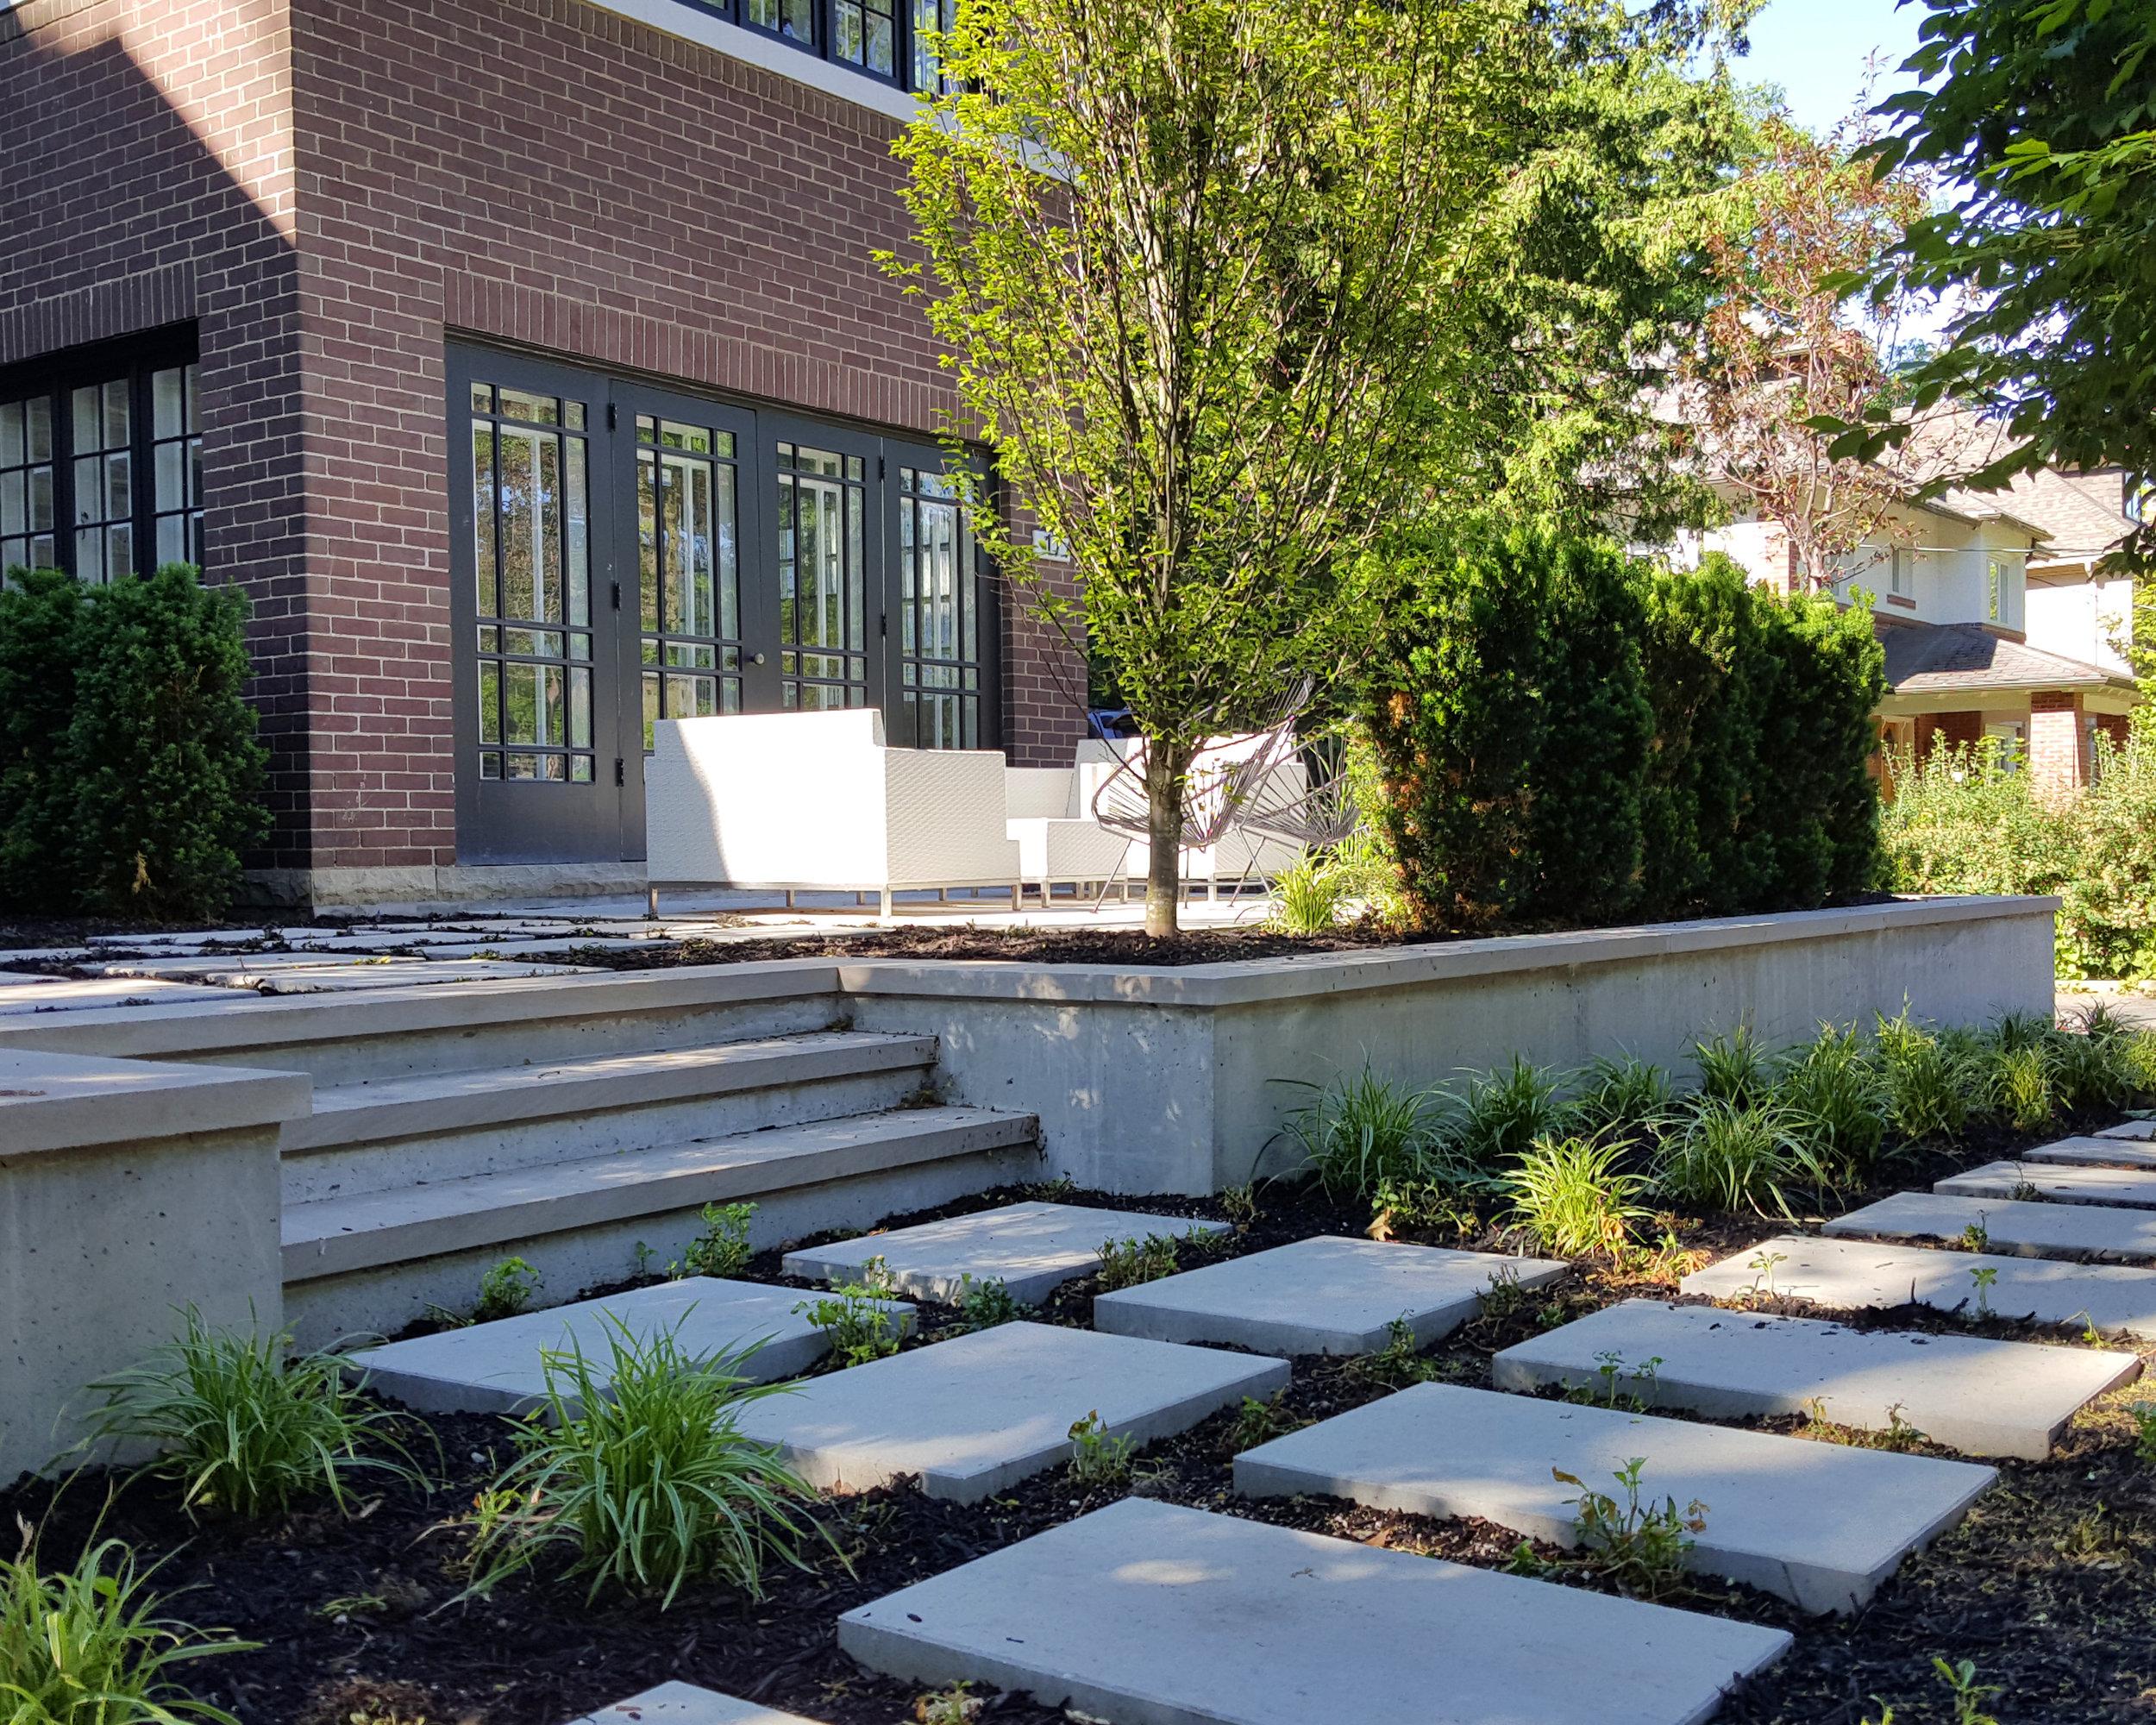 Modern-Concrete-Garden-Wall.jpg